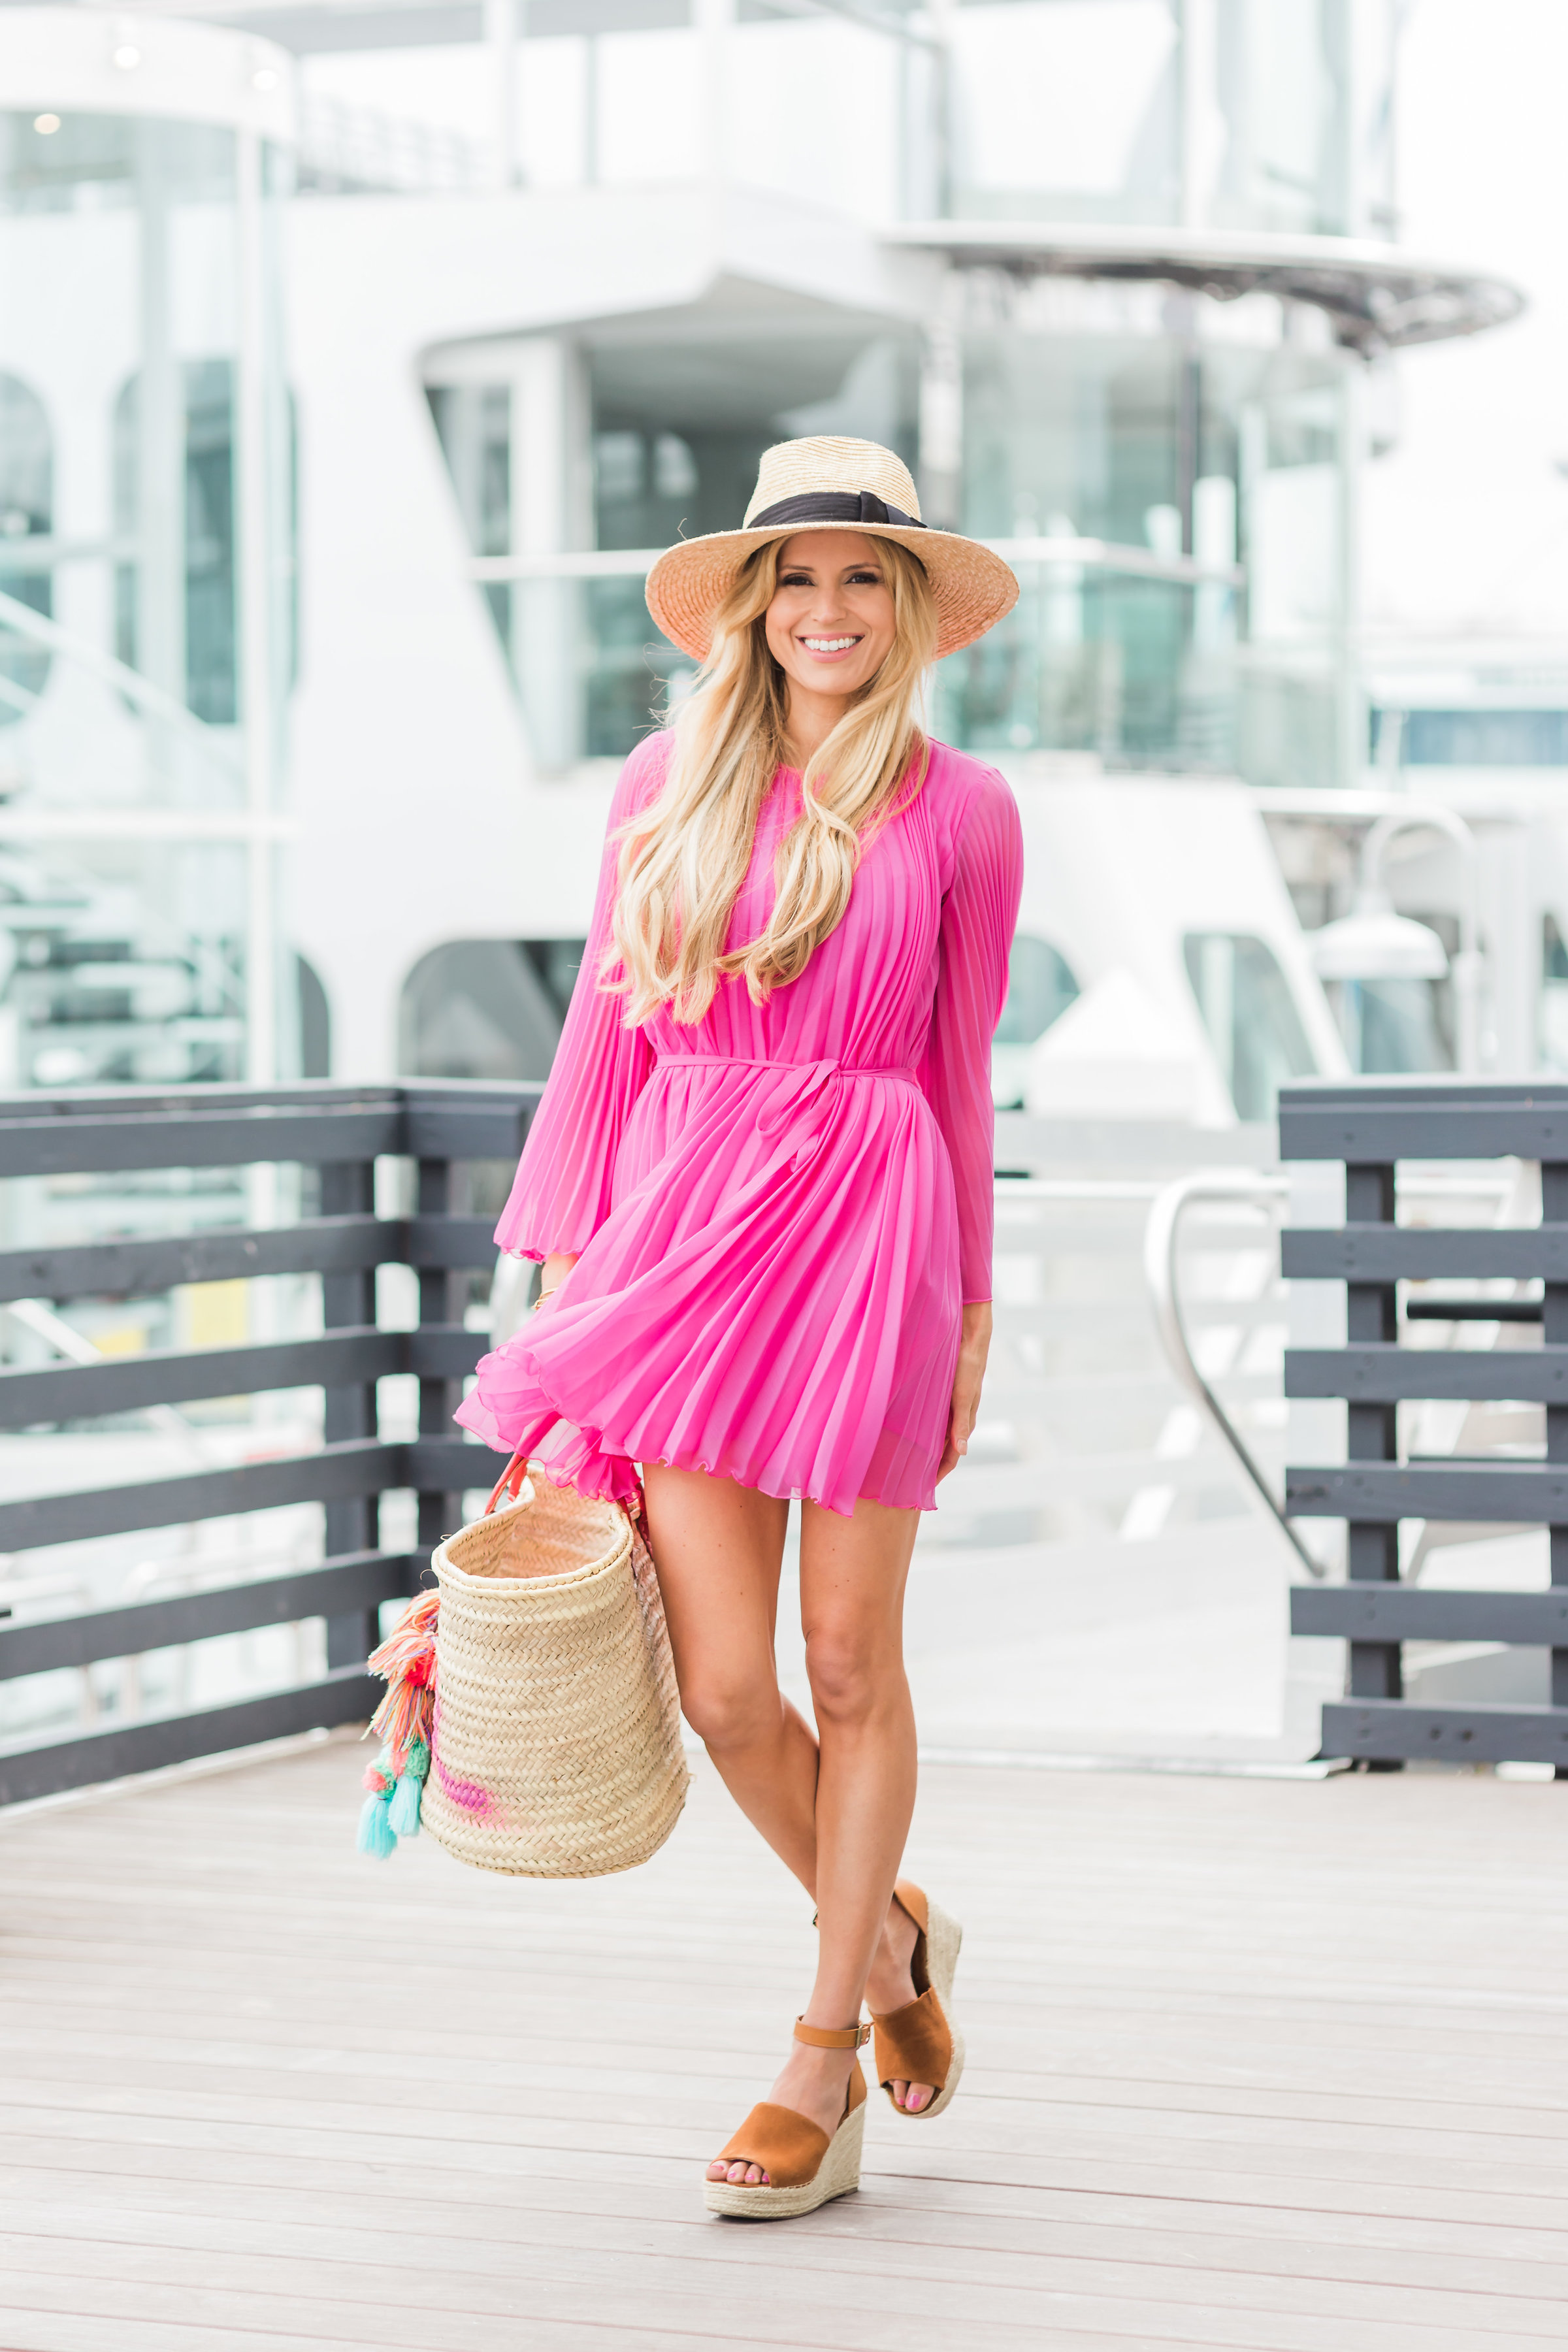 50e016bd468 ASOS flutter sleeve pleated mini dress pink. ASOS flutter sleeve pleated  mini dress pink. Chloe Espadrille Dupes